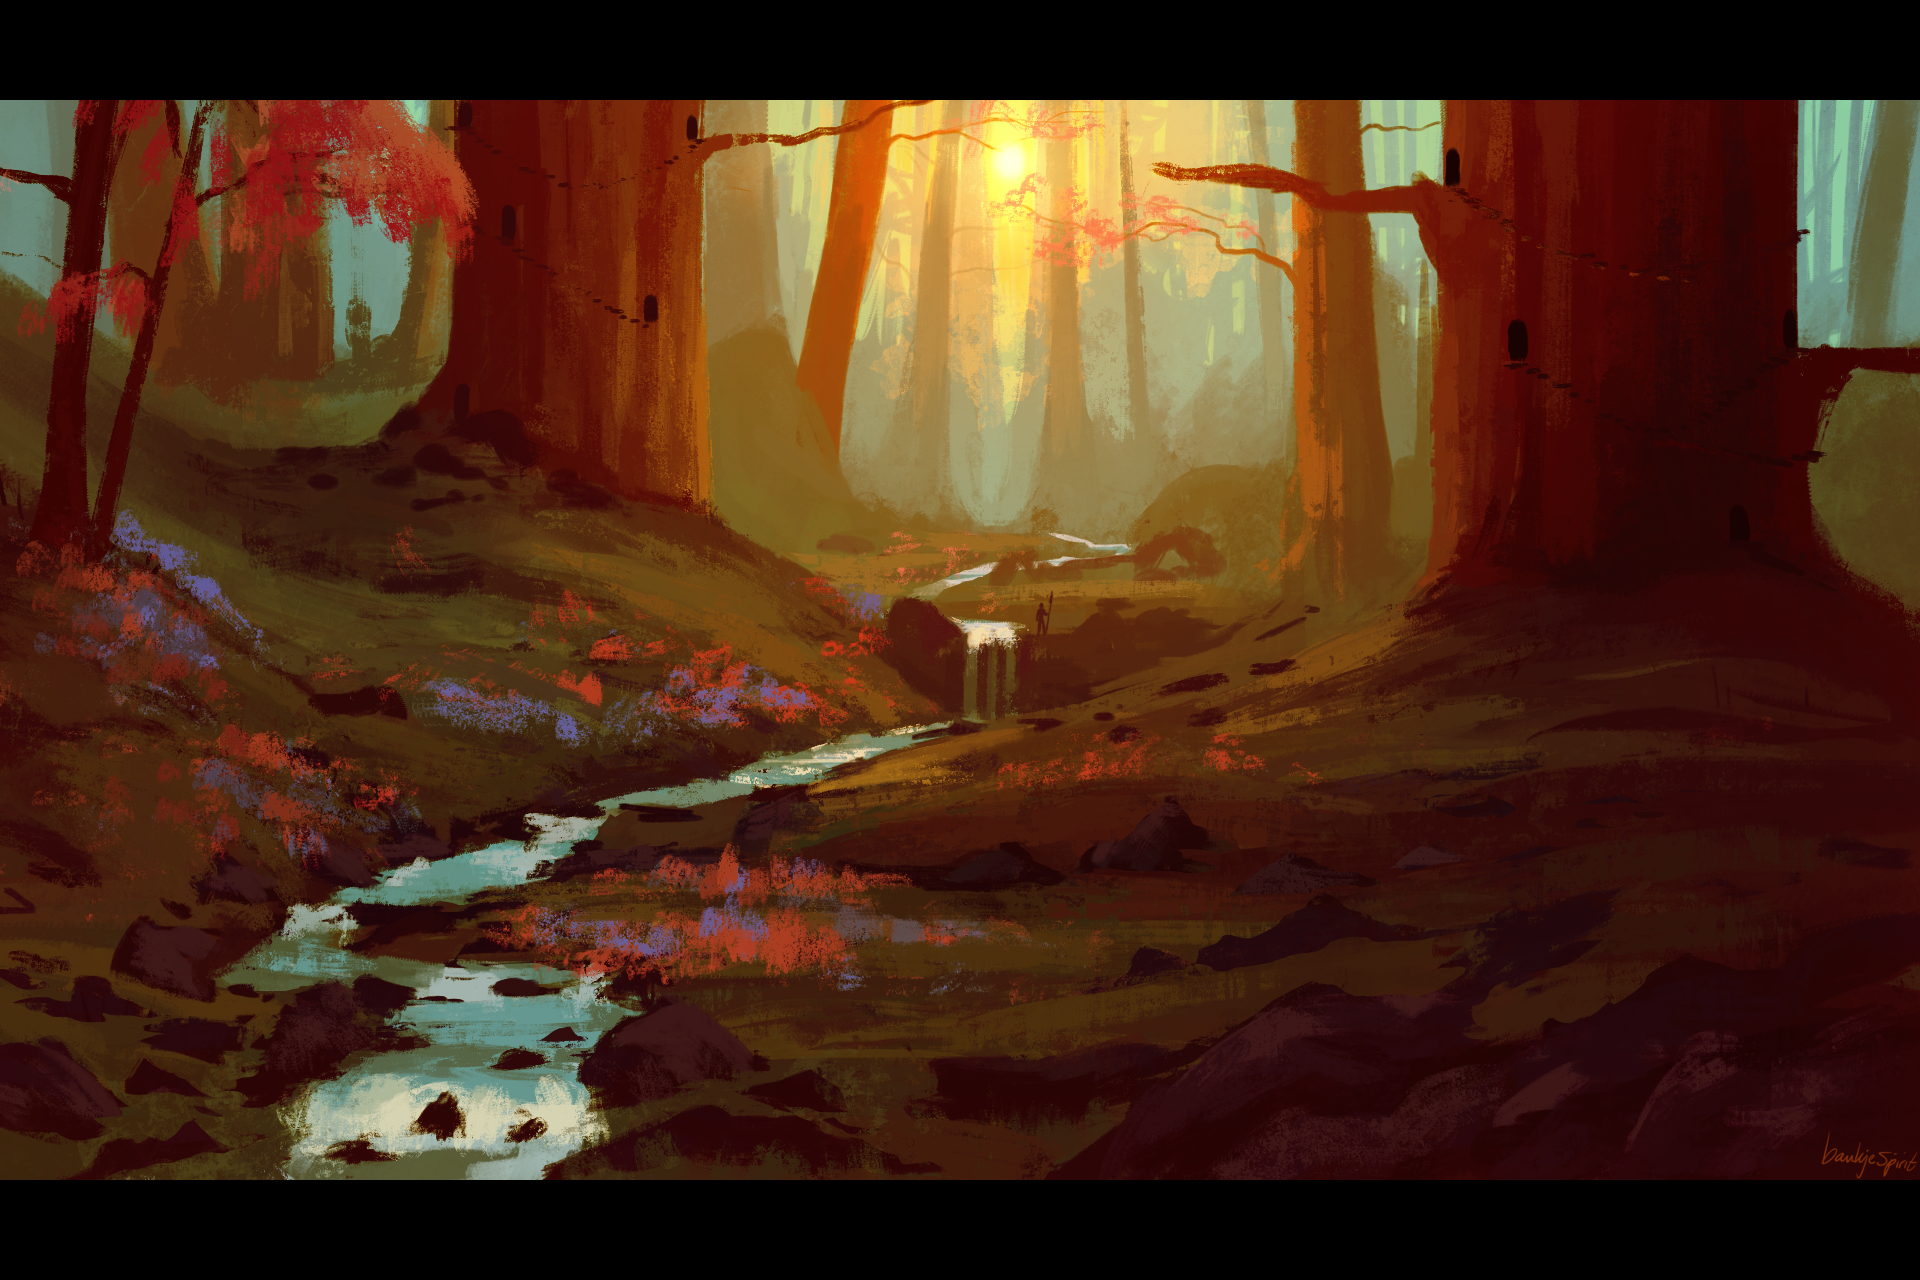 Forest speedpainting